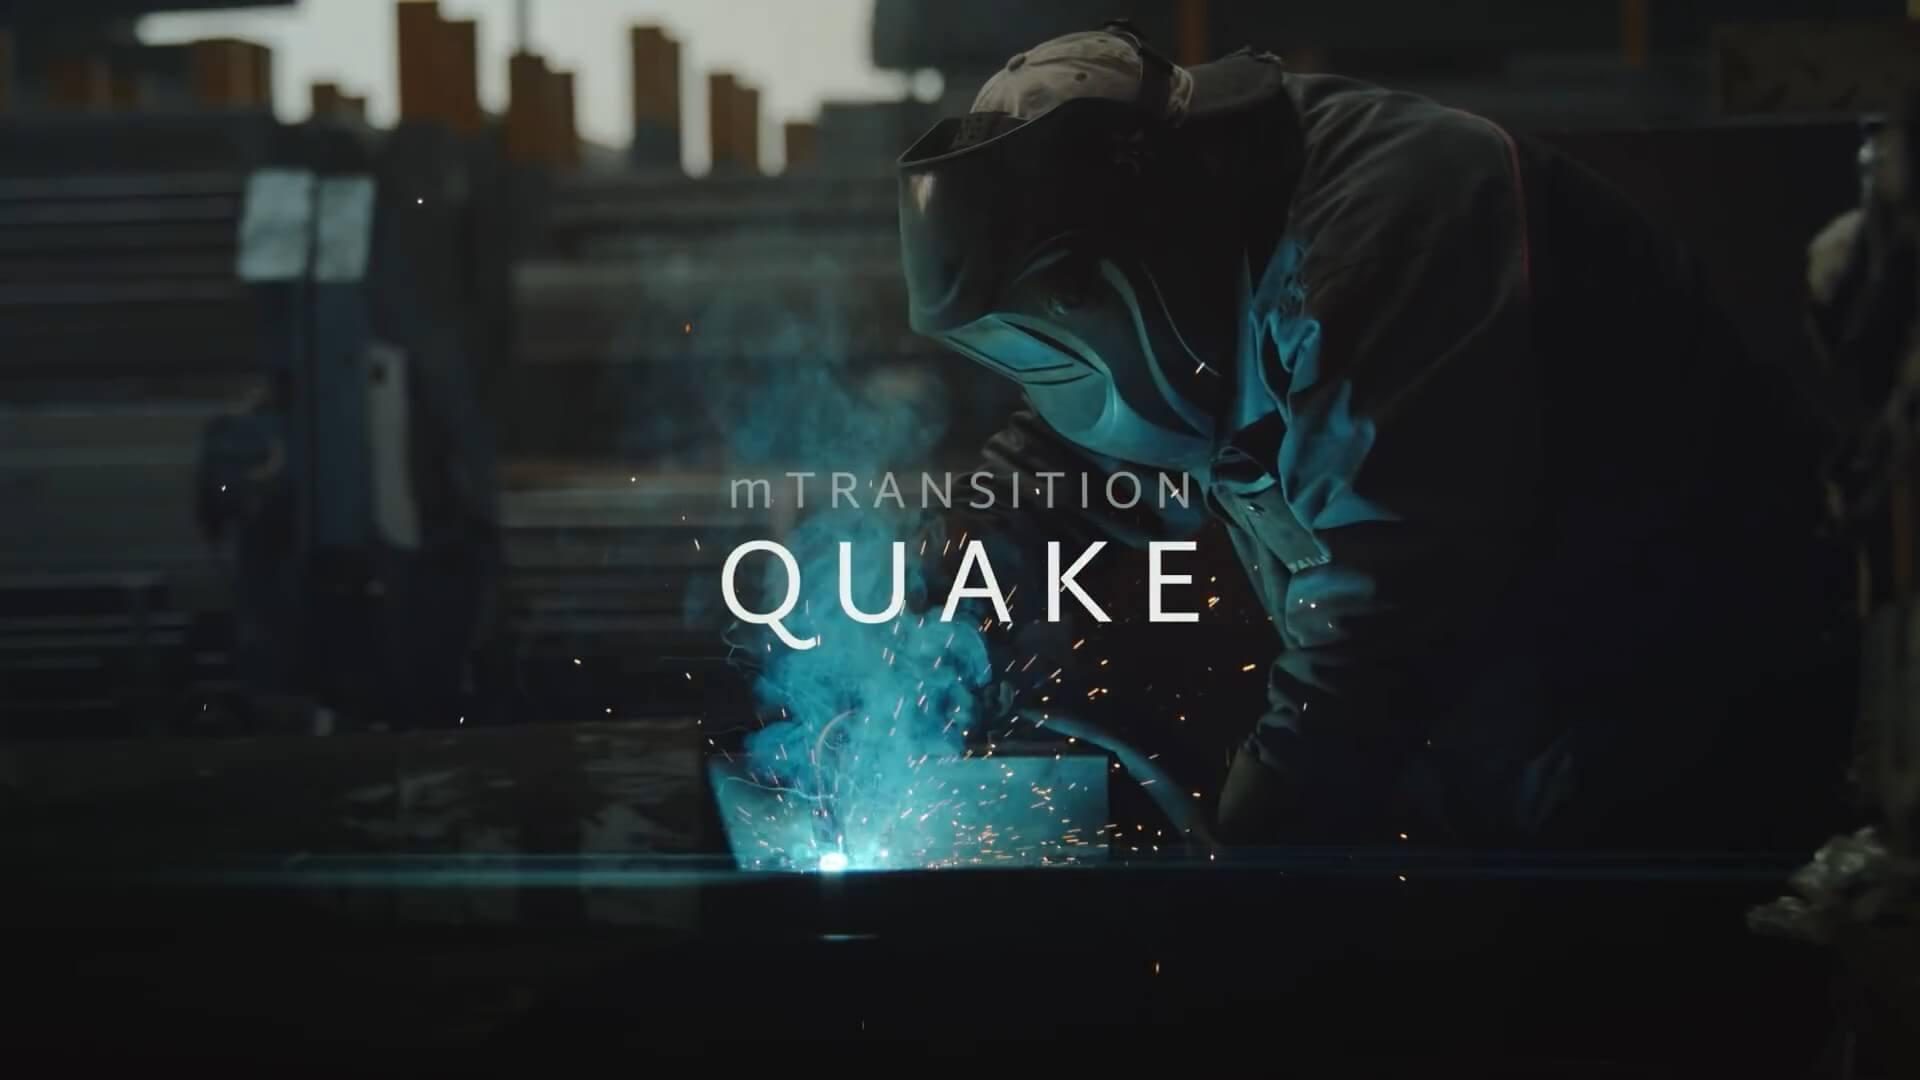 FCPX转场插件 50种震撼史诗电影大片抖动过渡 mTransition Quake 完整版 支持M1